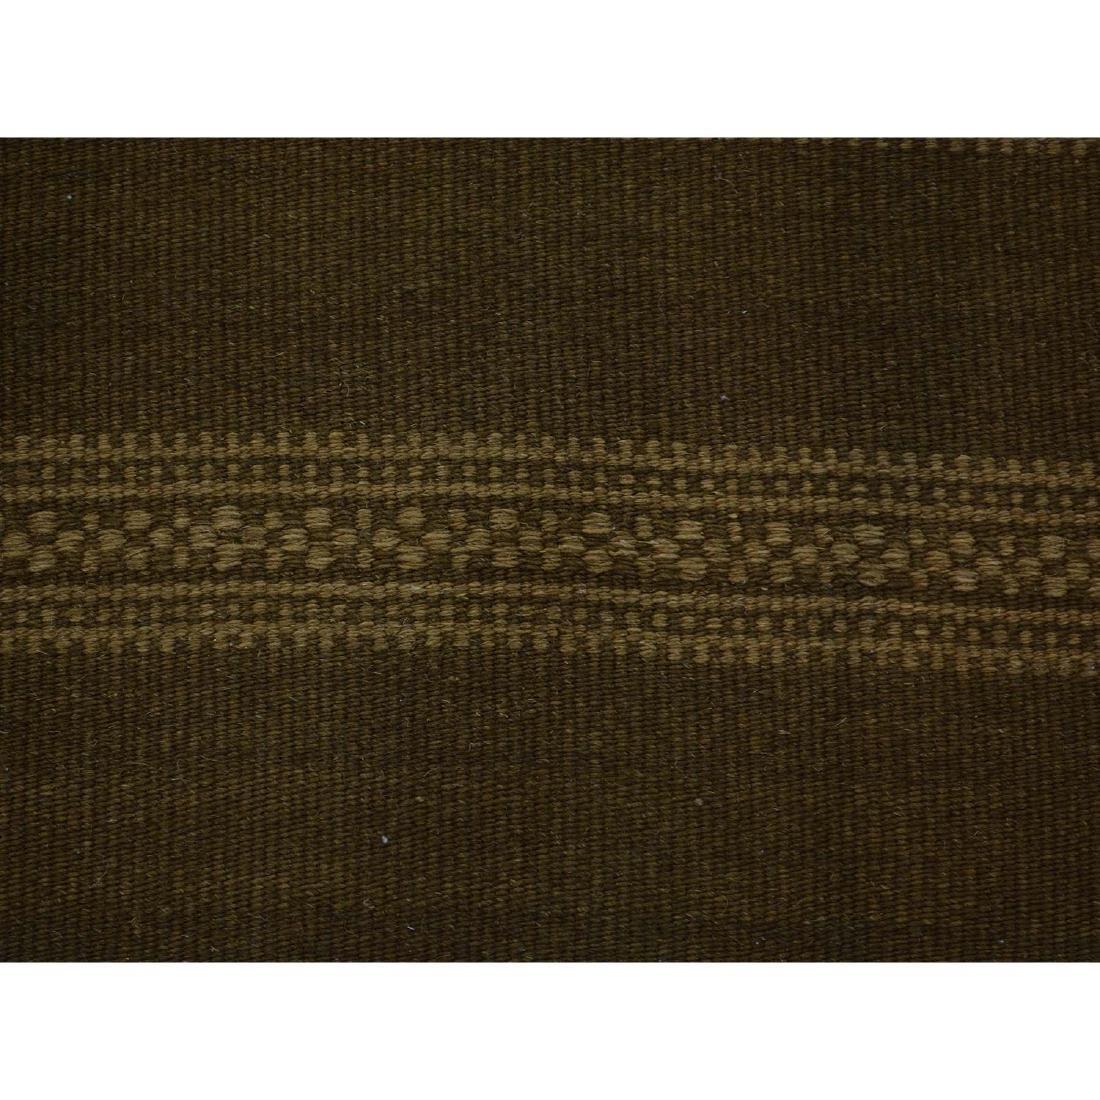 Wool Durie Kilim Rug Hand Woven Flat Weave 3x5.1 - 2